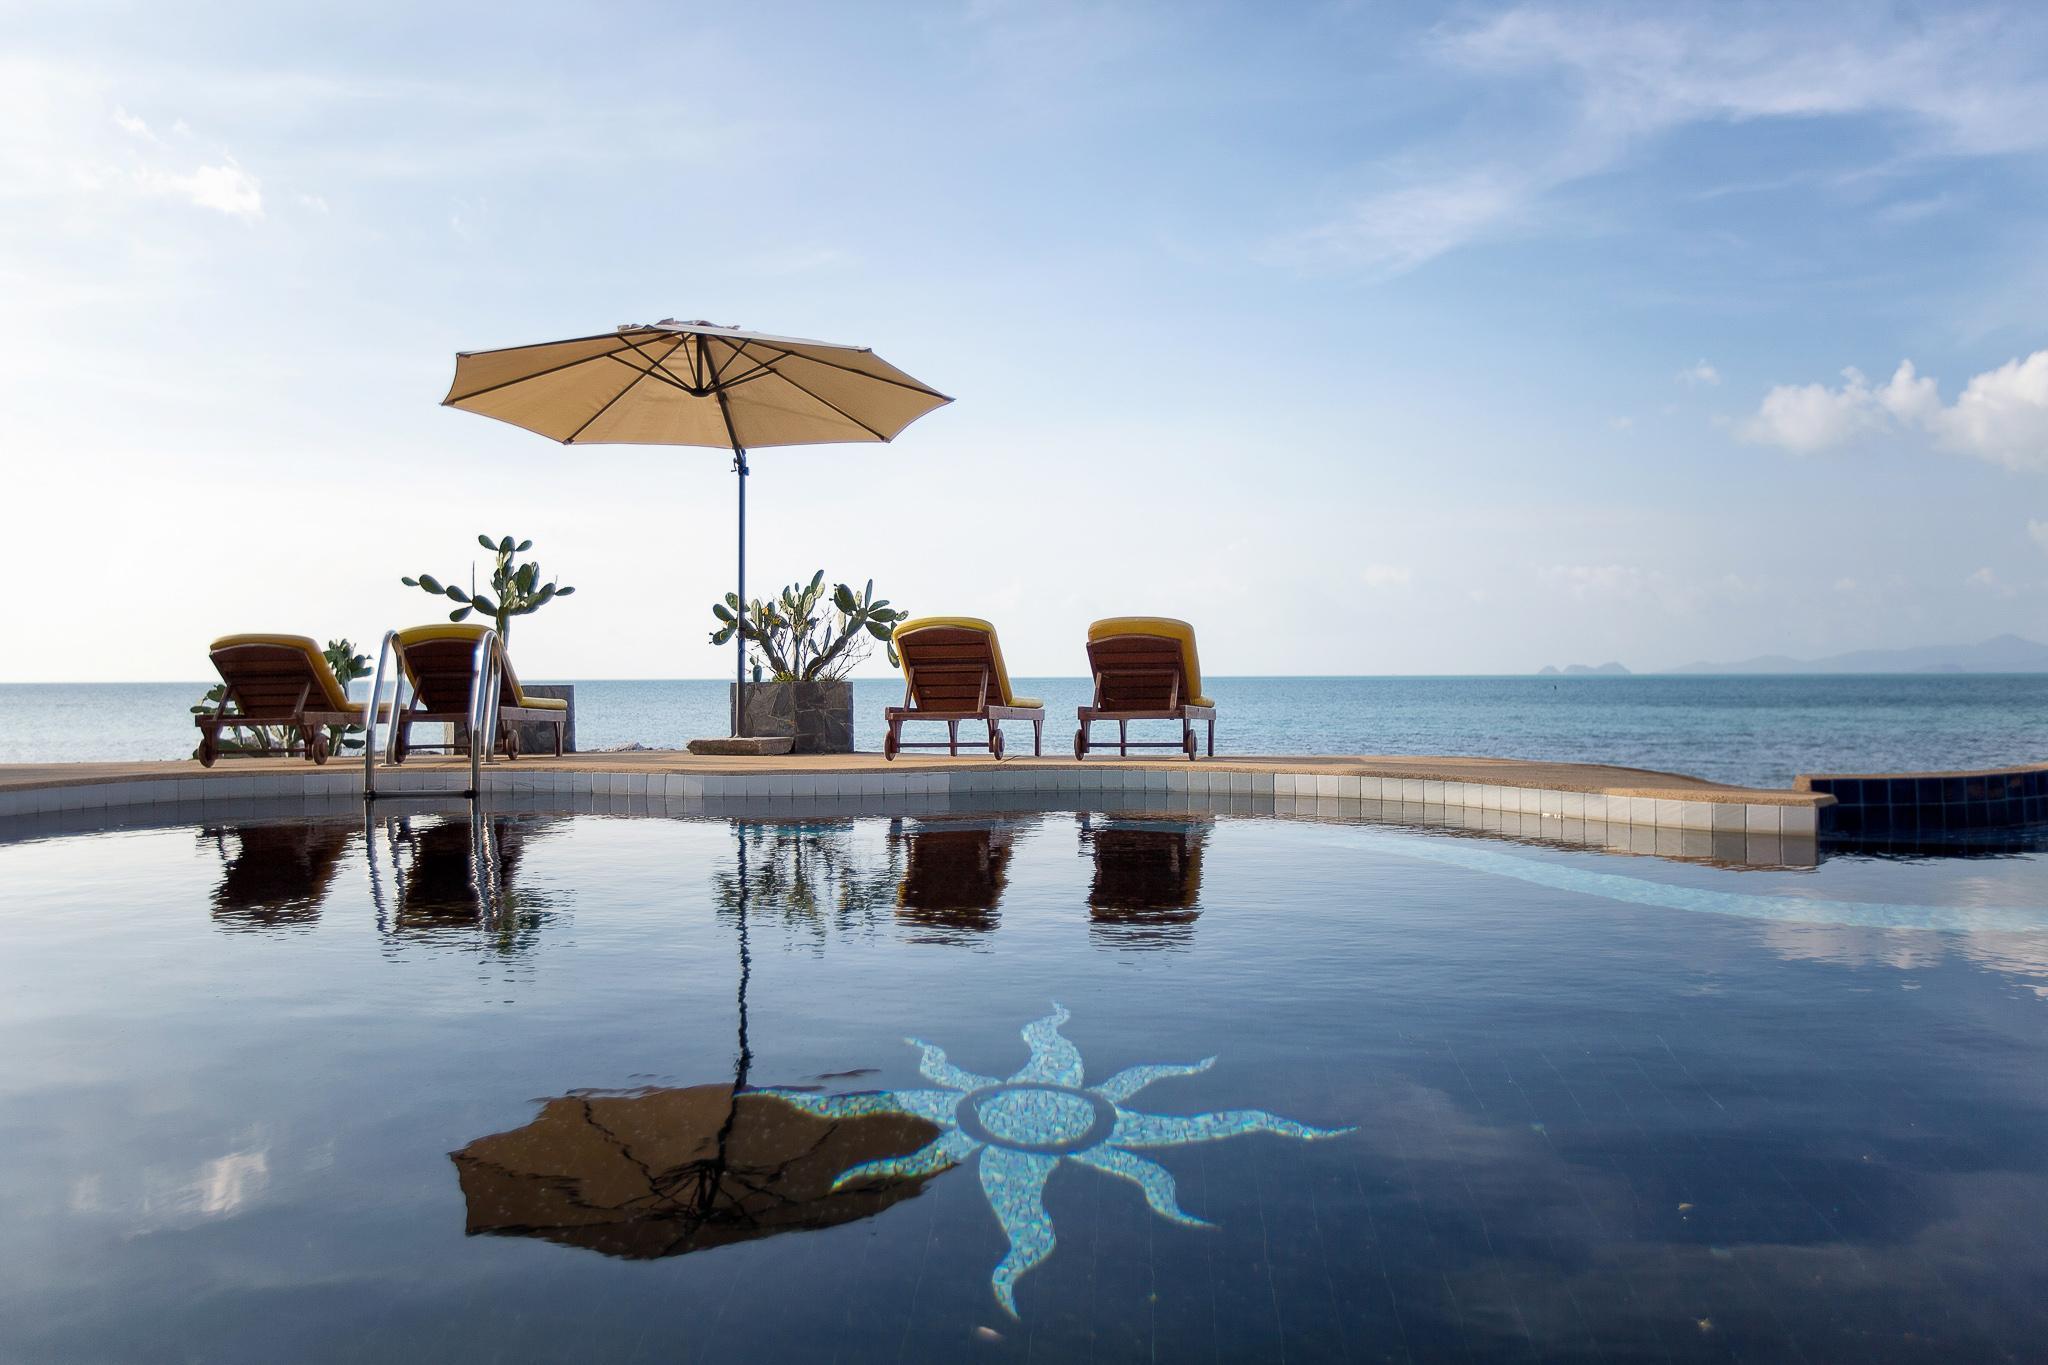 Villa Su- Absolute Sunset Beachfront Pool Villa วิลลา 9 ห้องนอน 10 ห้องน้ำส่วนตัว ขนาด 5800 ตร.ม. – หาดเฉวง